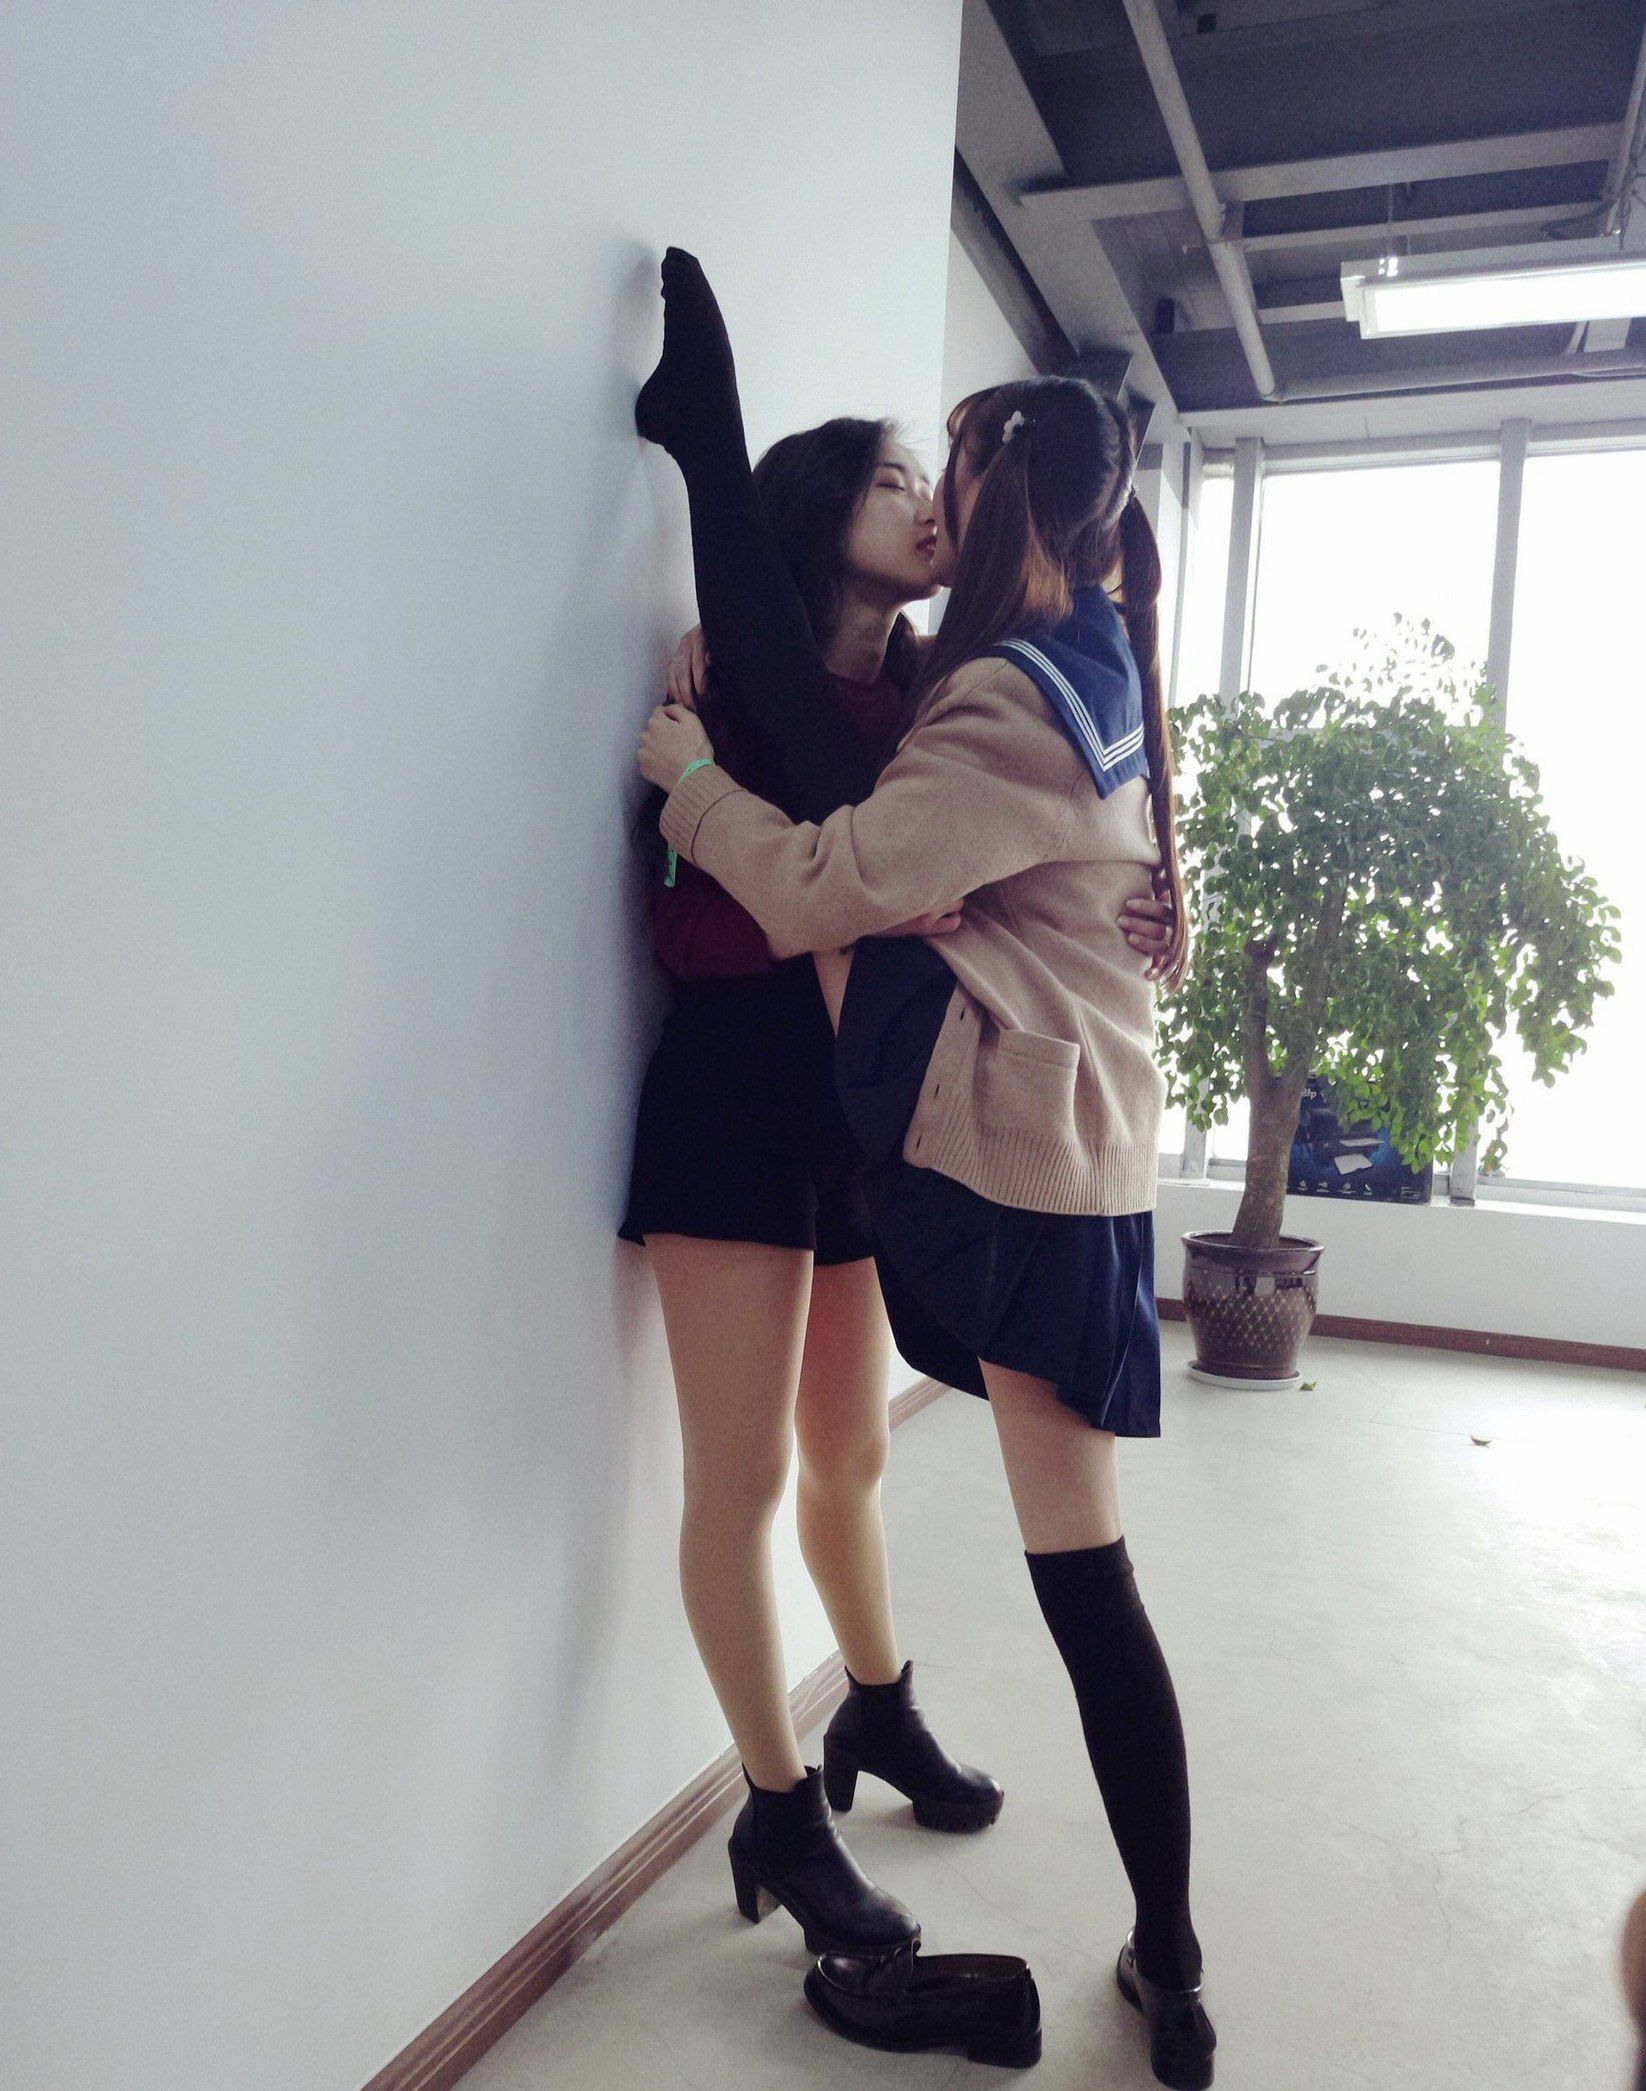 Pin by Asuka_JAN on wow | Japan girl, Asian girl, Asia girl